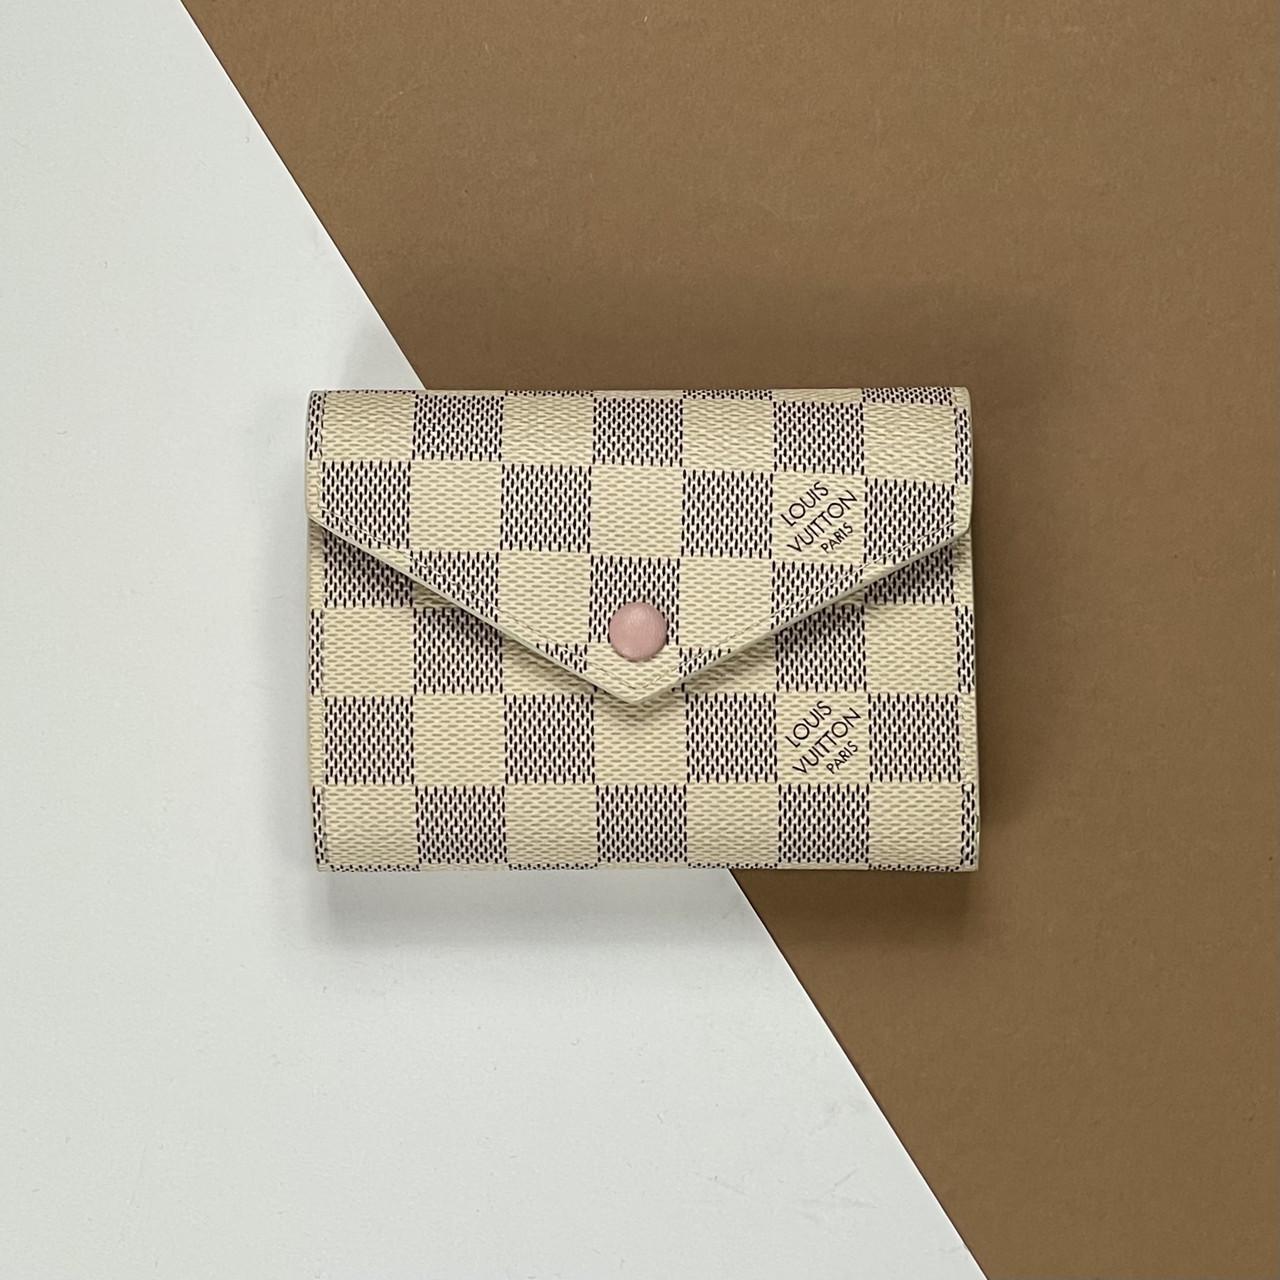 Кошелек Louis Vuitton Victorine Damier Azur (Луи Виттон) арт. 22-19